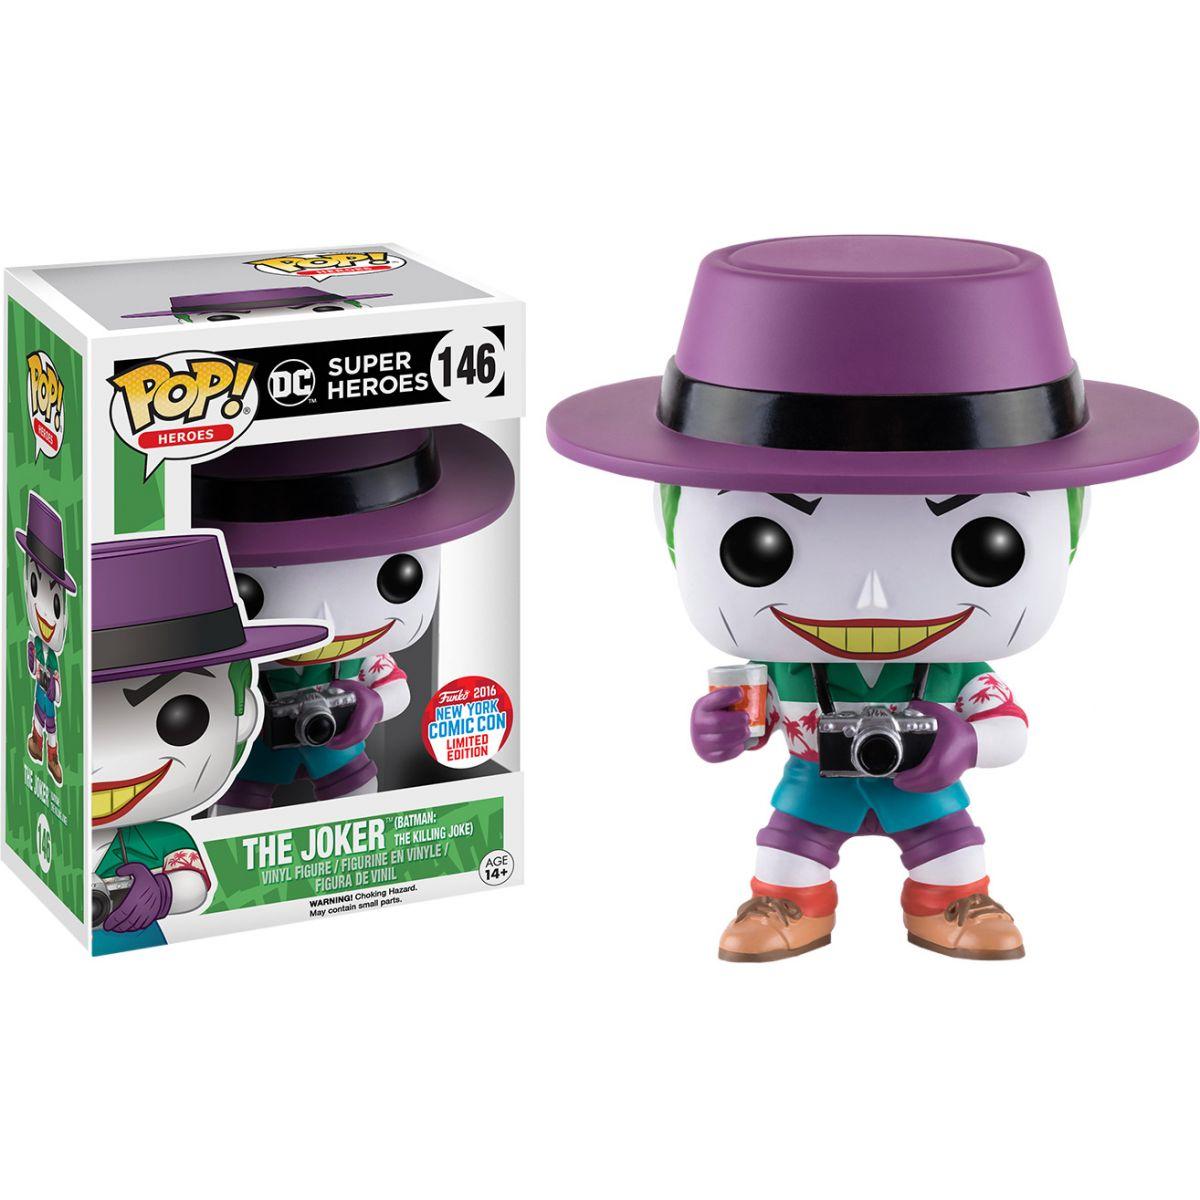 Funko POP! The Joker - The Killing Joke - NYC Comic Con Limited Edition - Funko